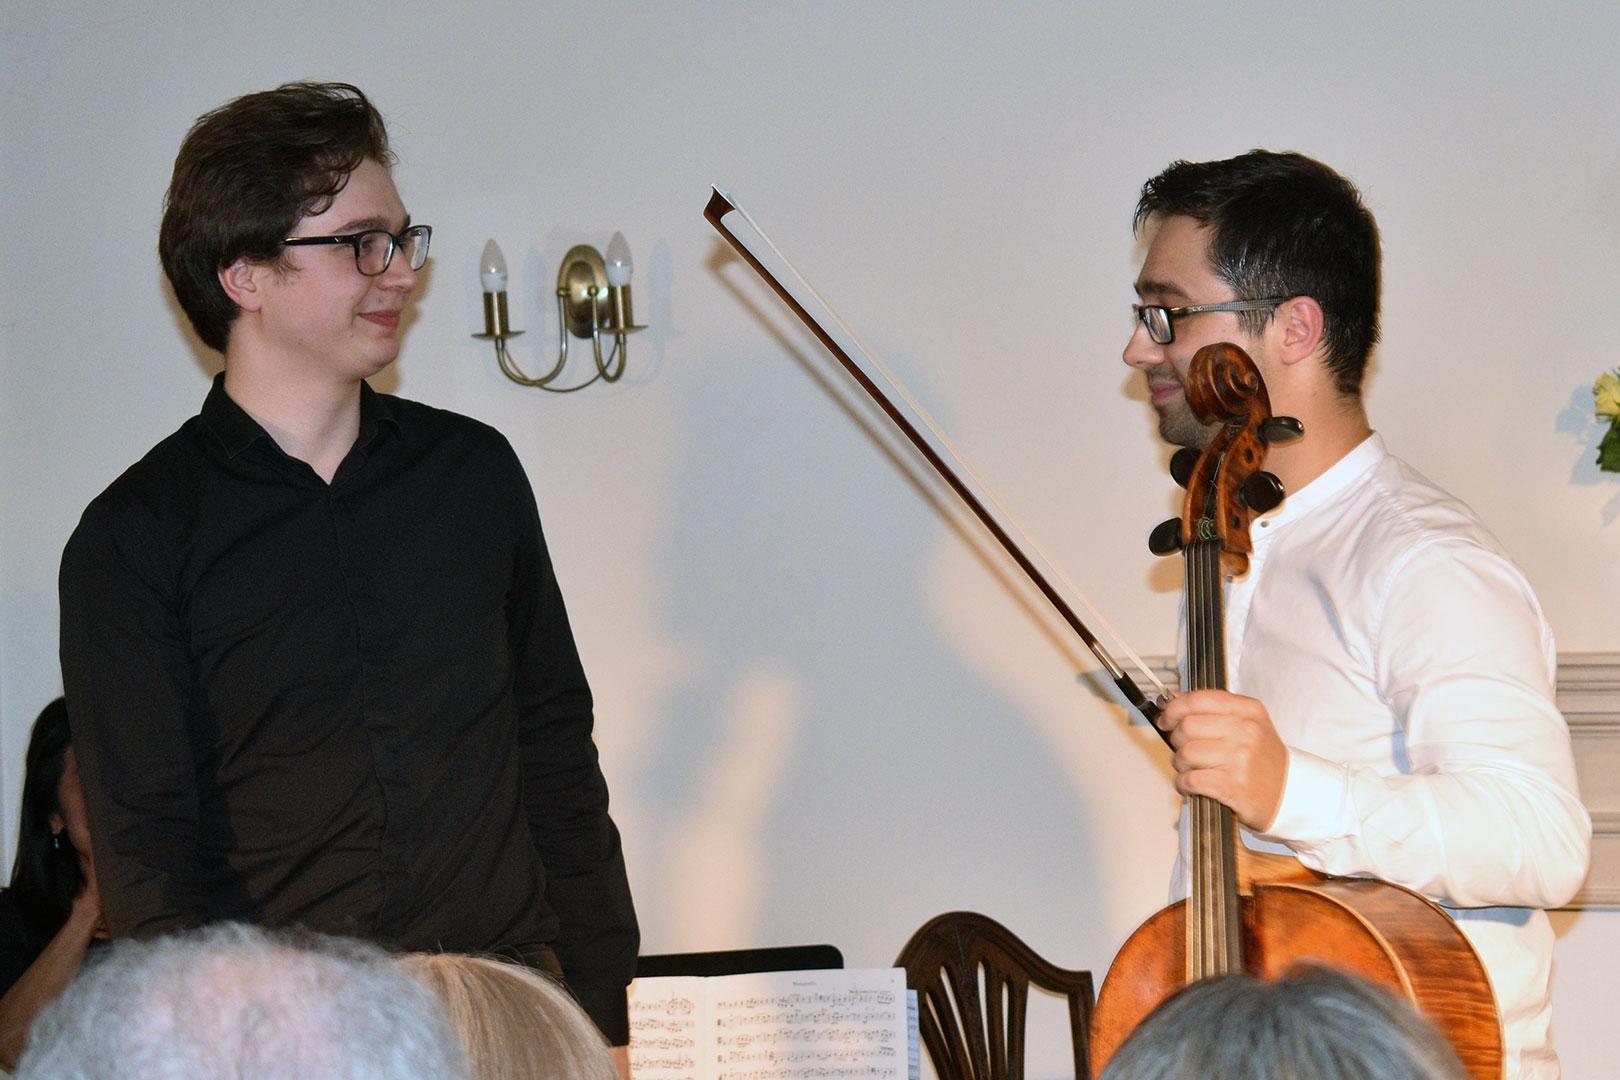 Michael Petrov & Erdem Mısırlıoğlu at Breinton